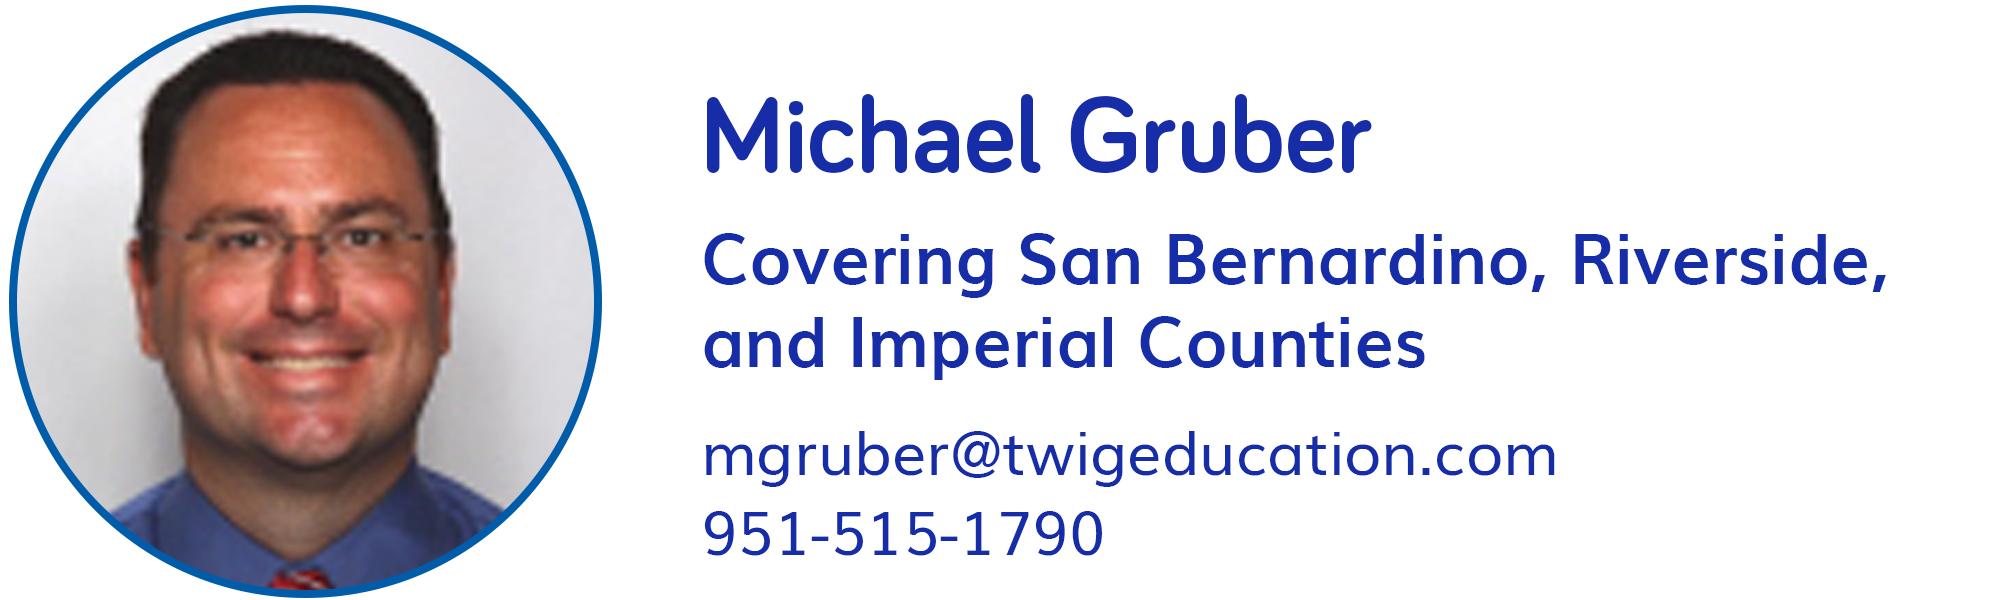 Michael Gruber, mgruber@twigeducation.com, 951-515-1790